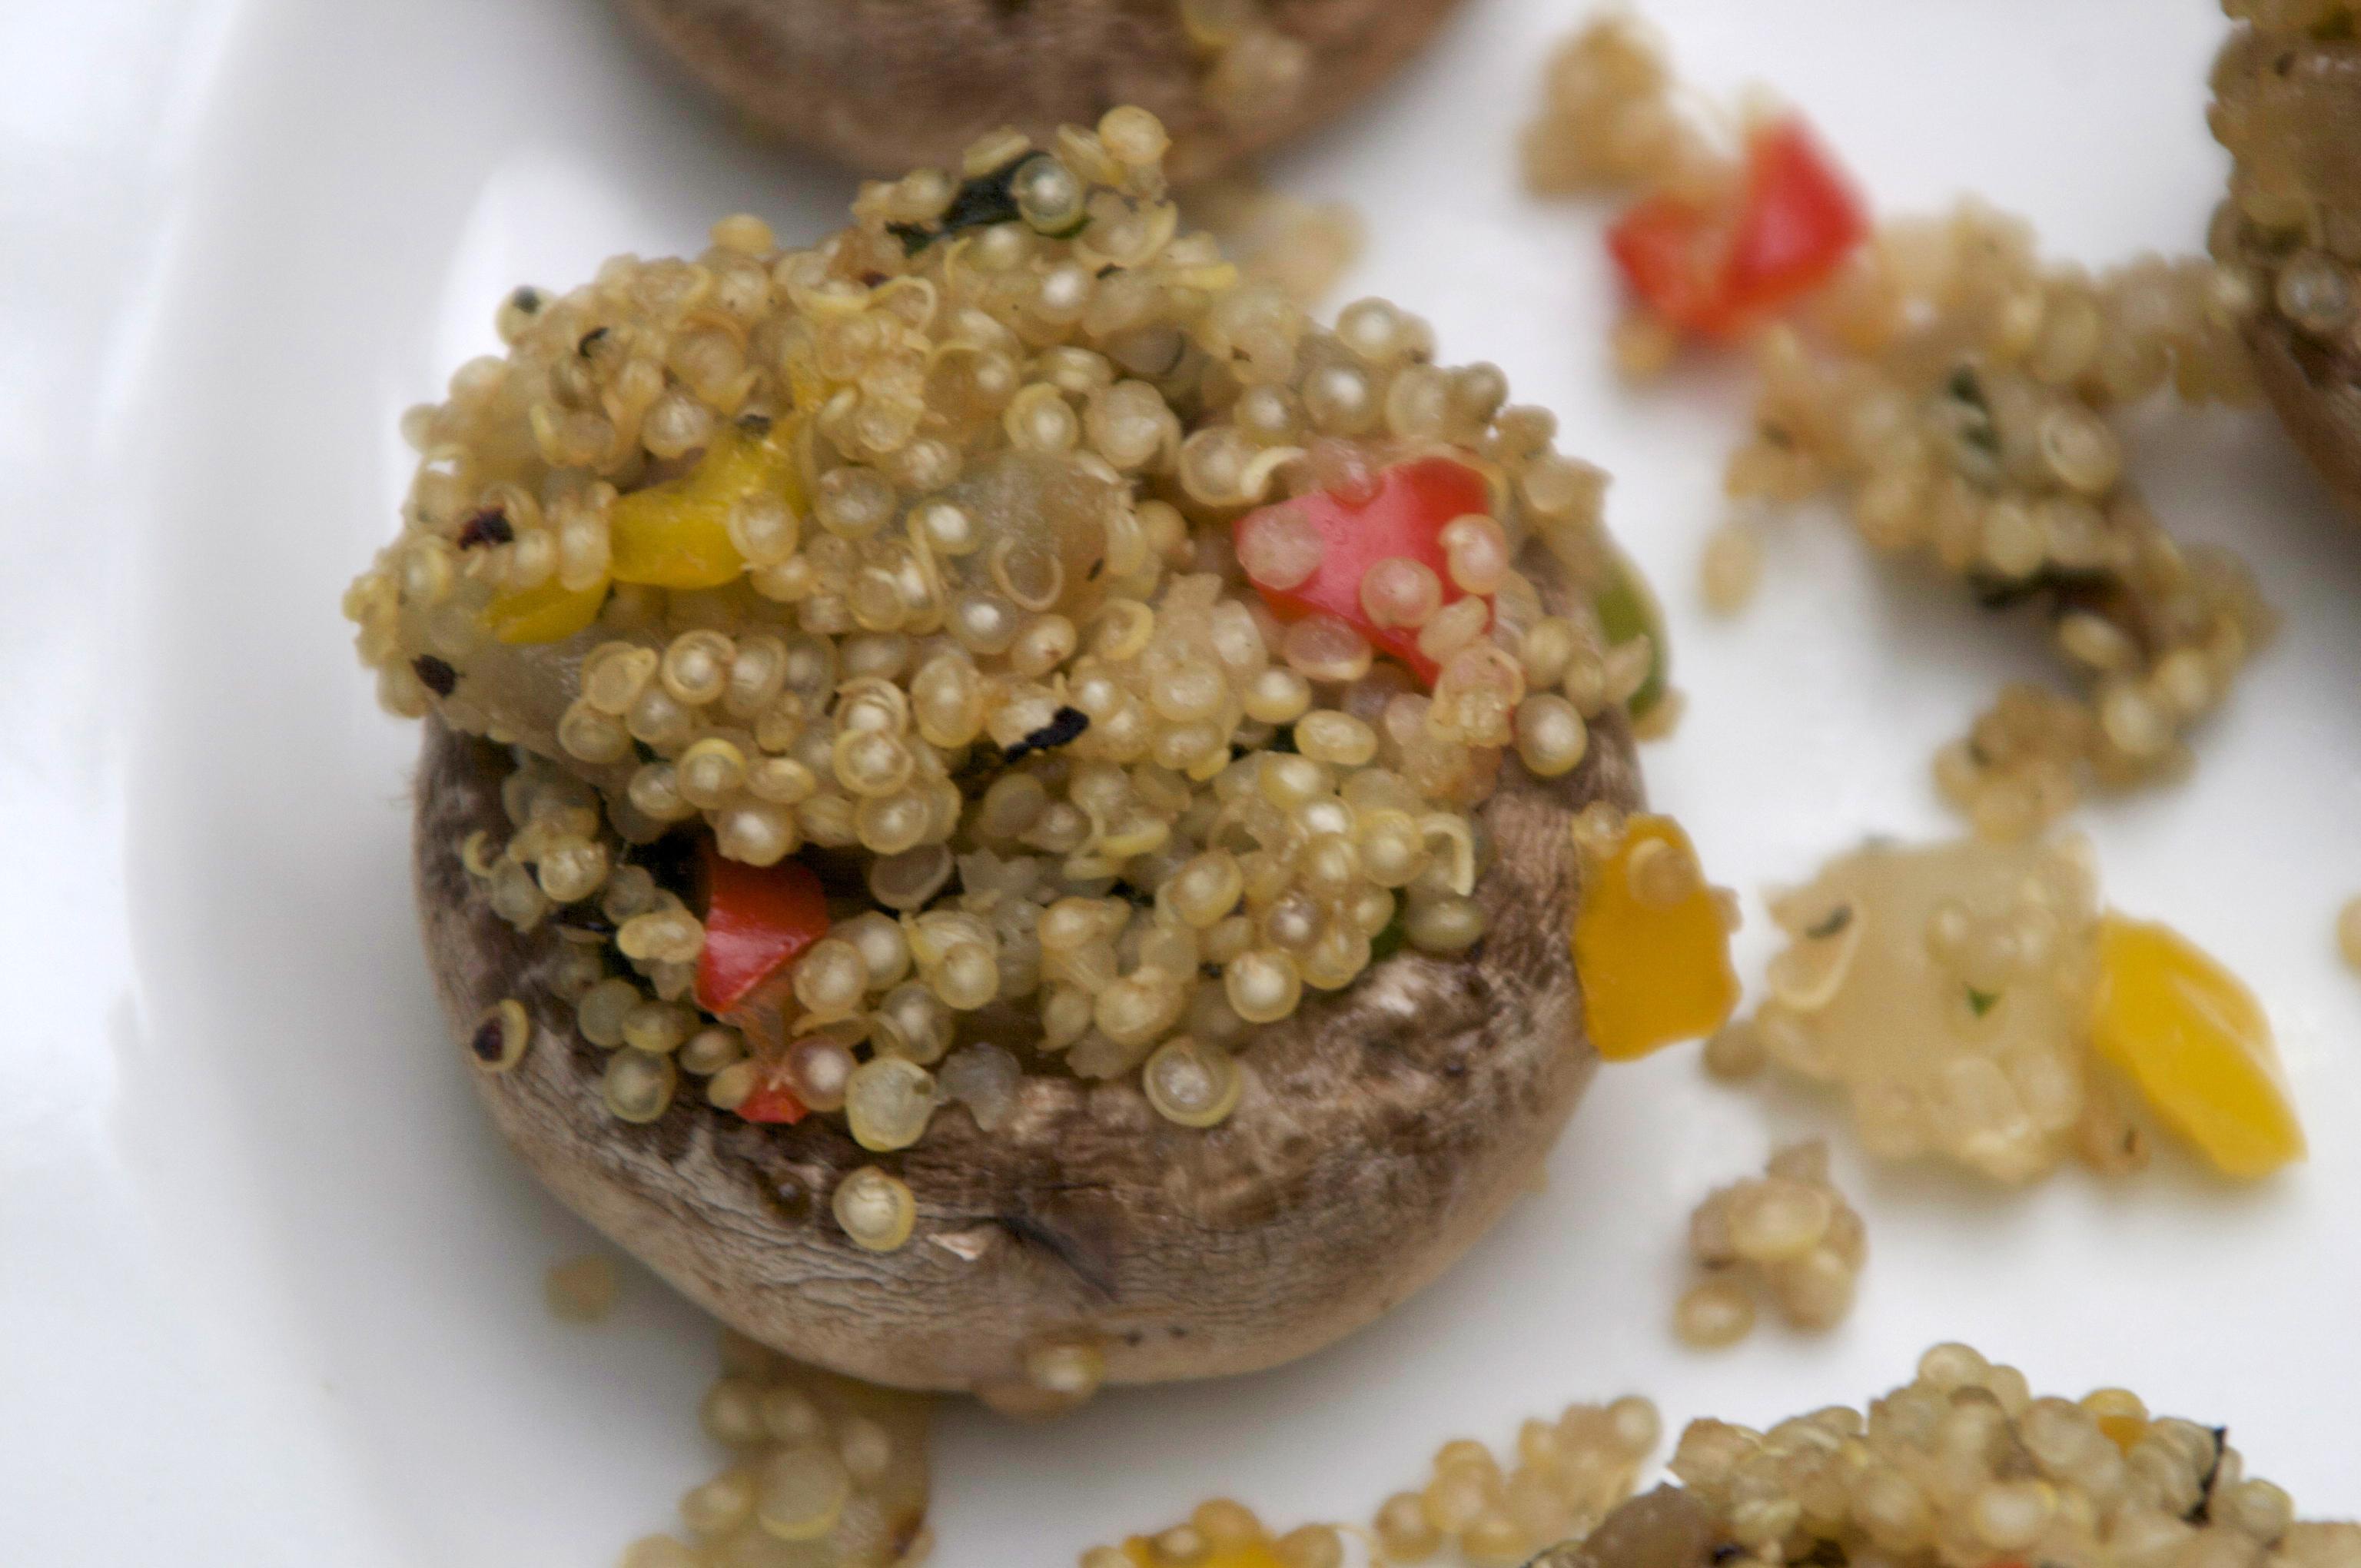 Spicy Vegan Quinoa Stuffed Mushrooms   The Pescetarian and The Pig